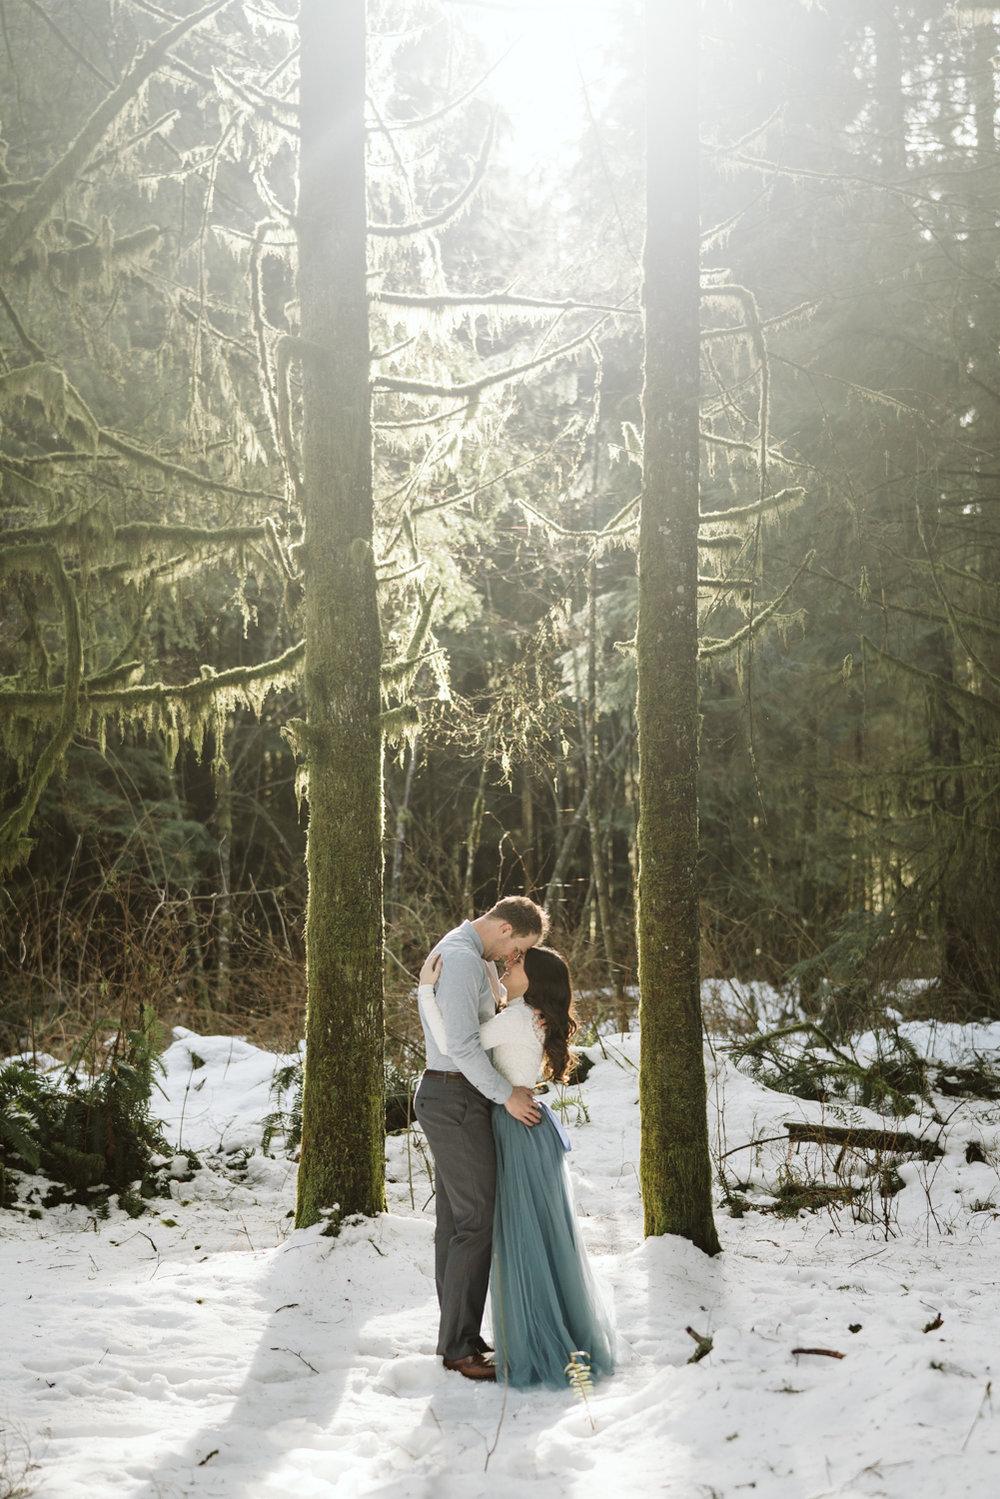 April Yentas Photography - Ethan & Nerissa-66.jpg